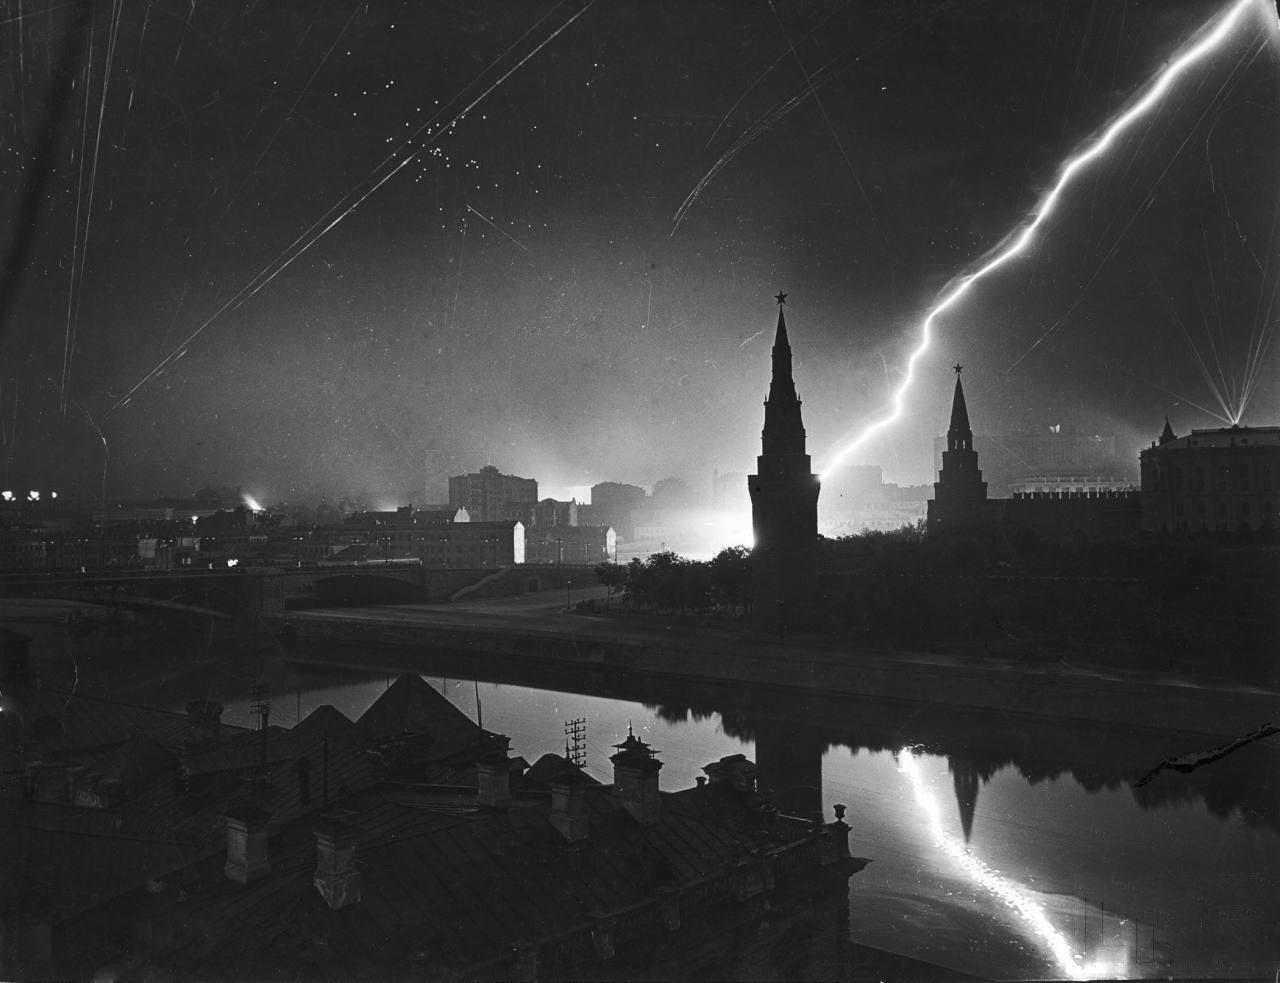 Москва 1941 год, отражение немецкого воздушного налёта